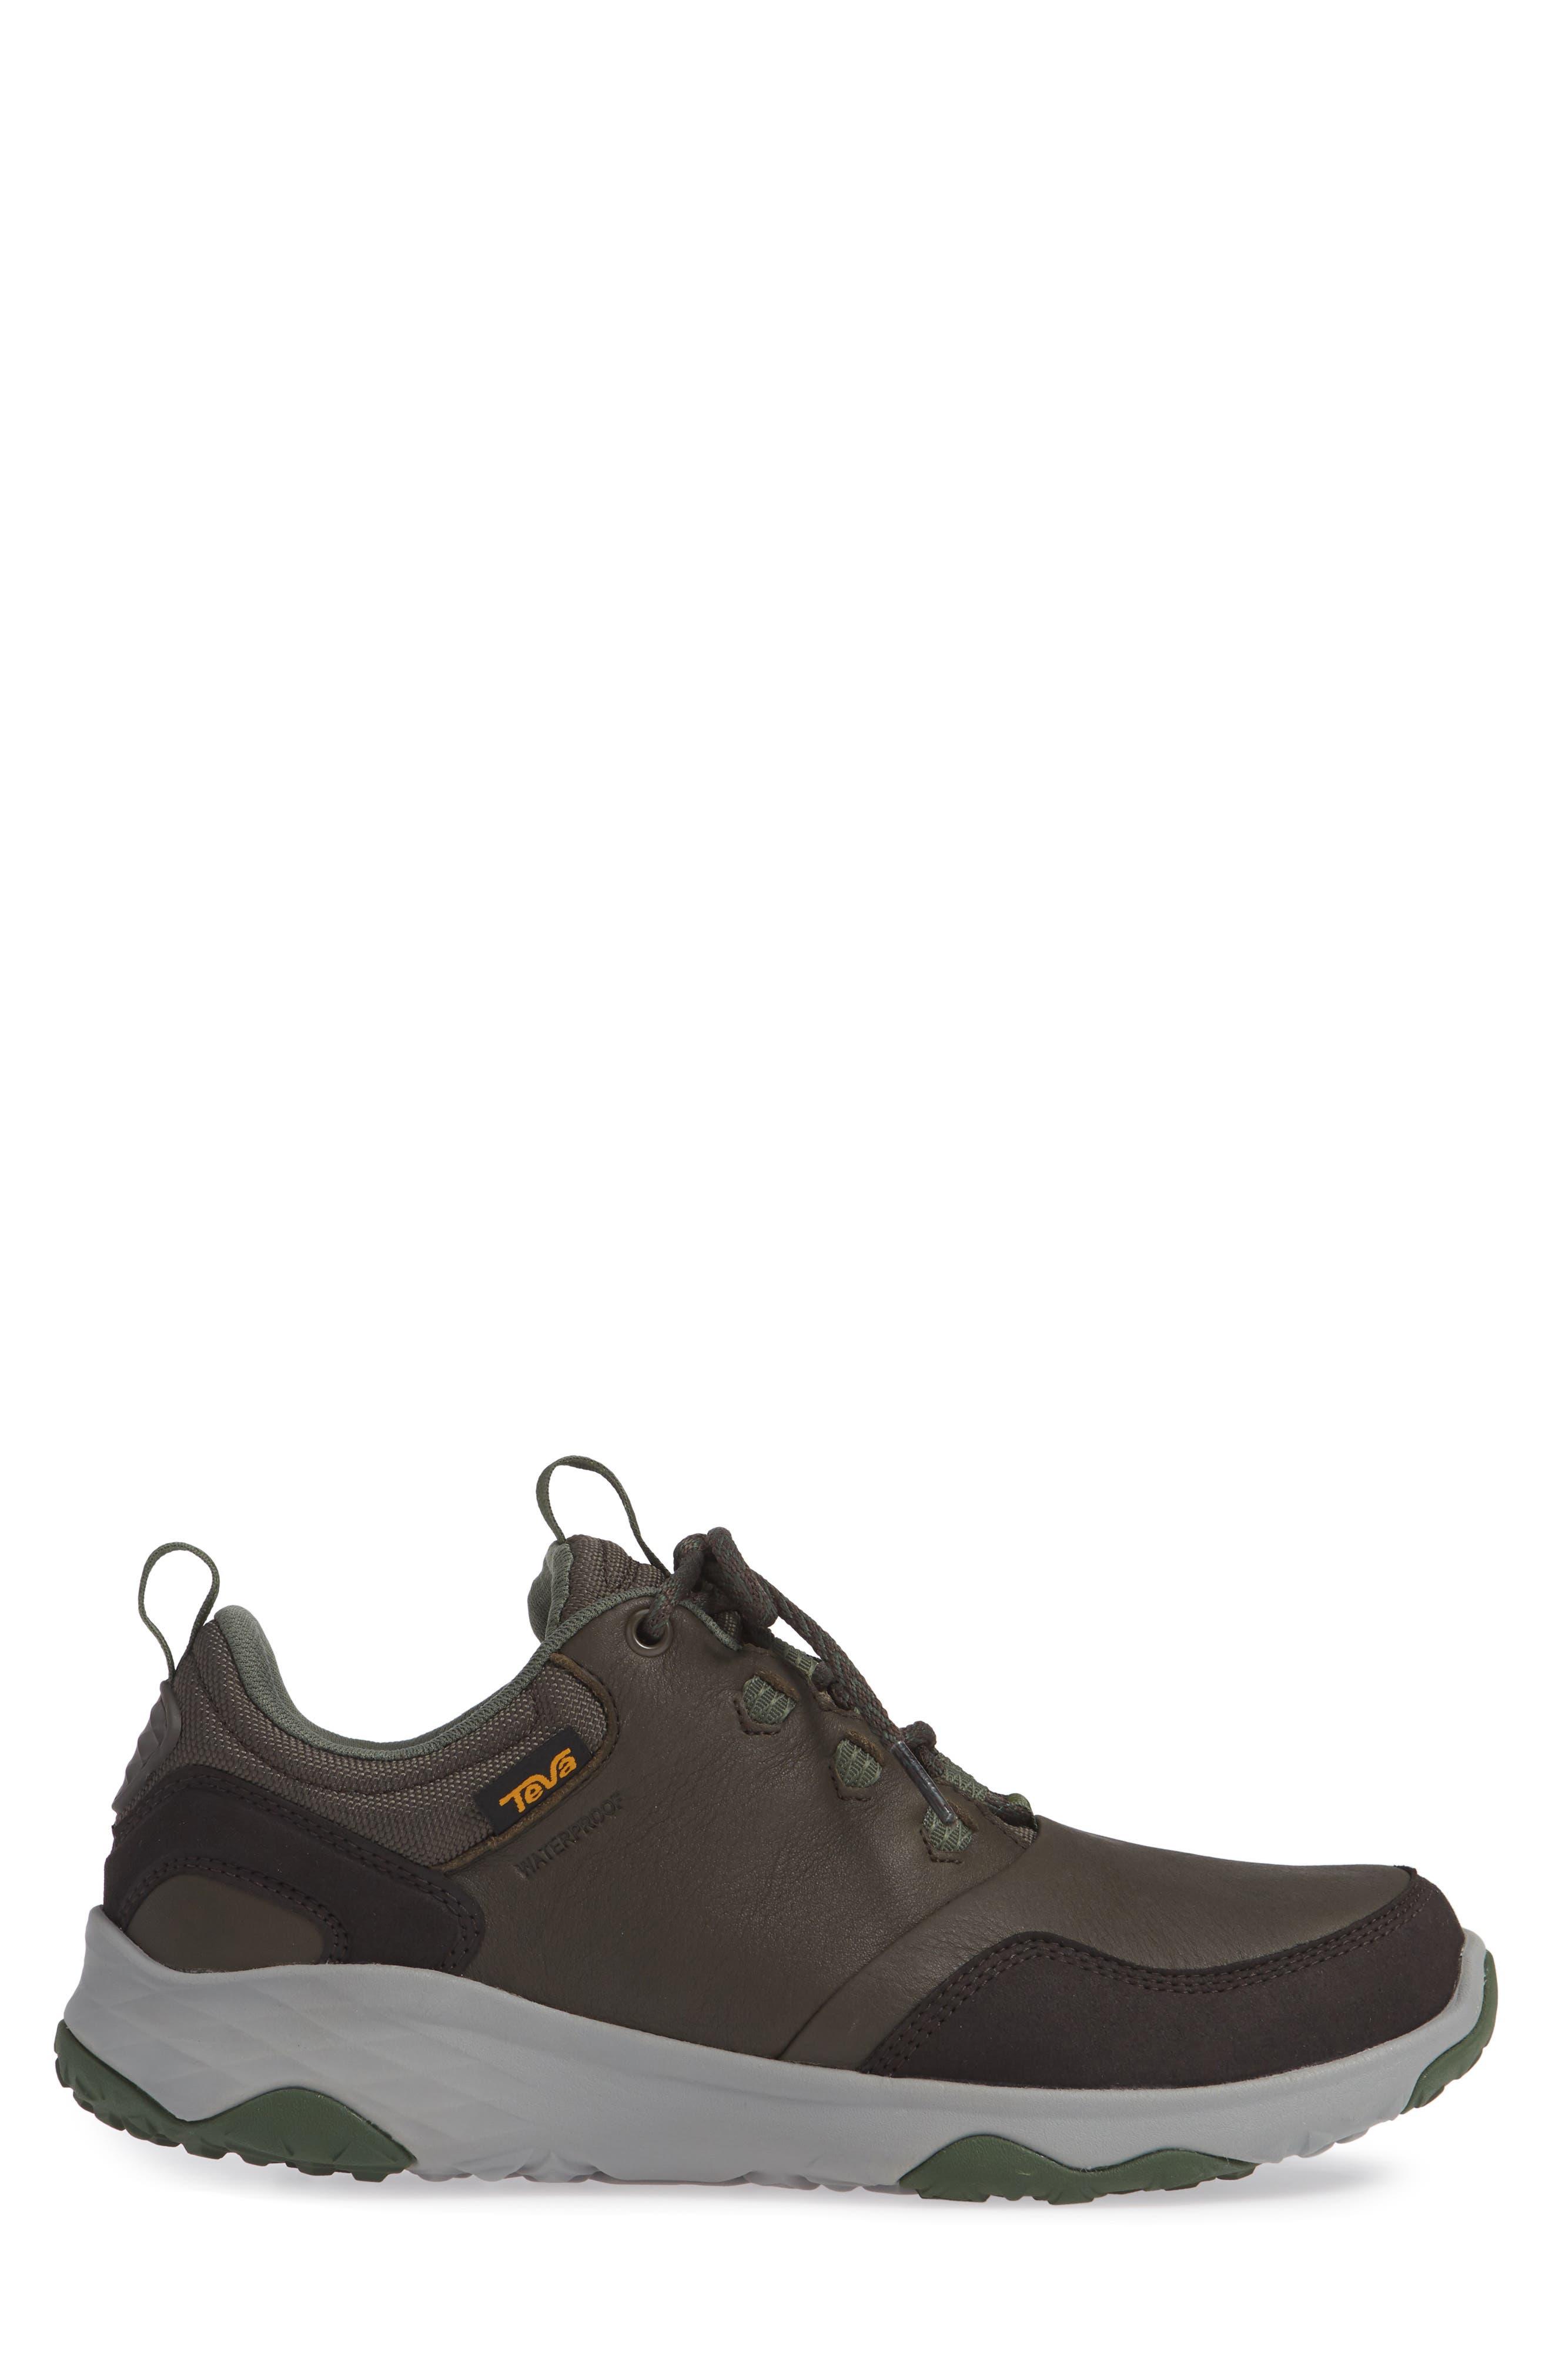 Arrowood Waterproof Sneaker,                             Alternate thumbnail 3, color,                             BLACK OLIVE LEATHER